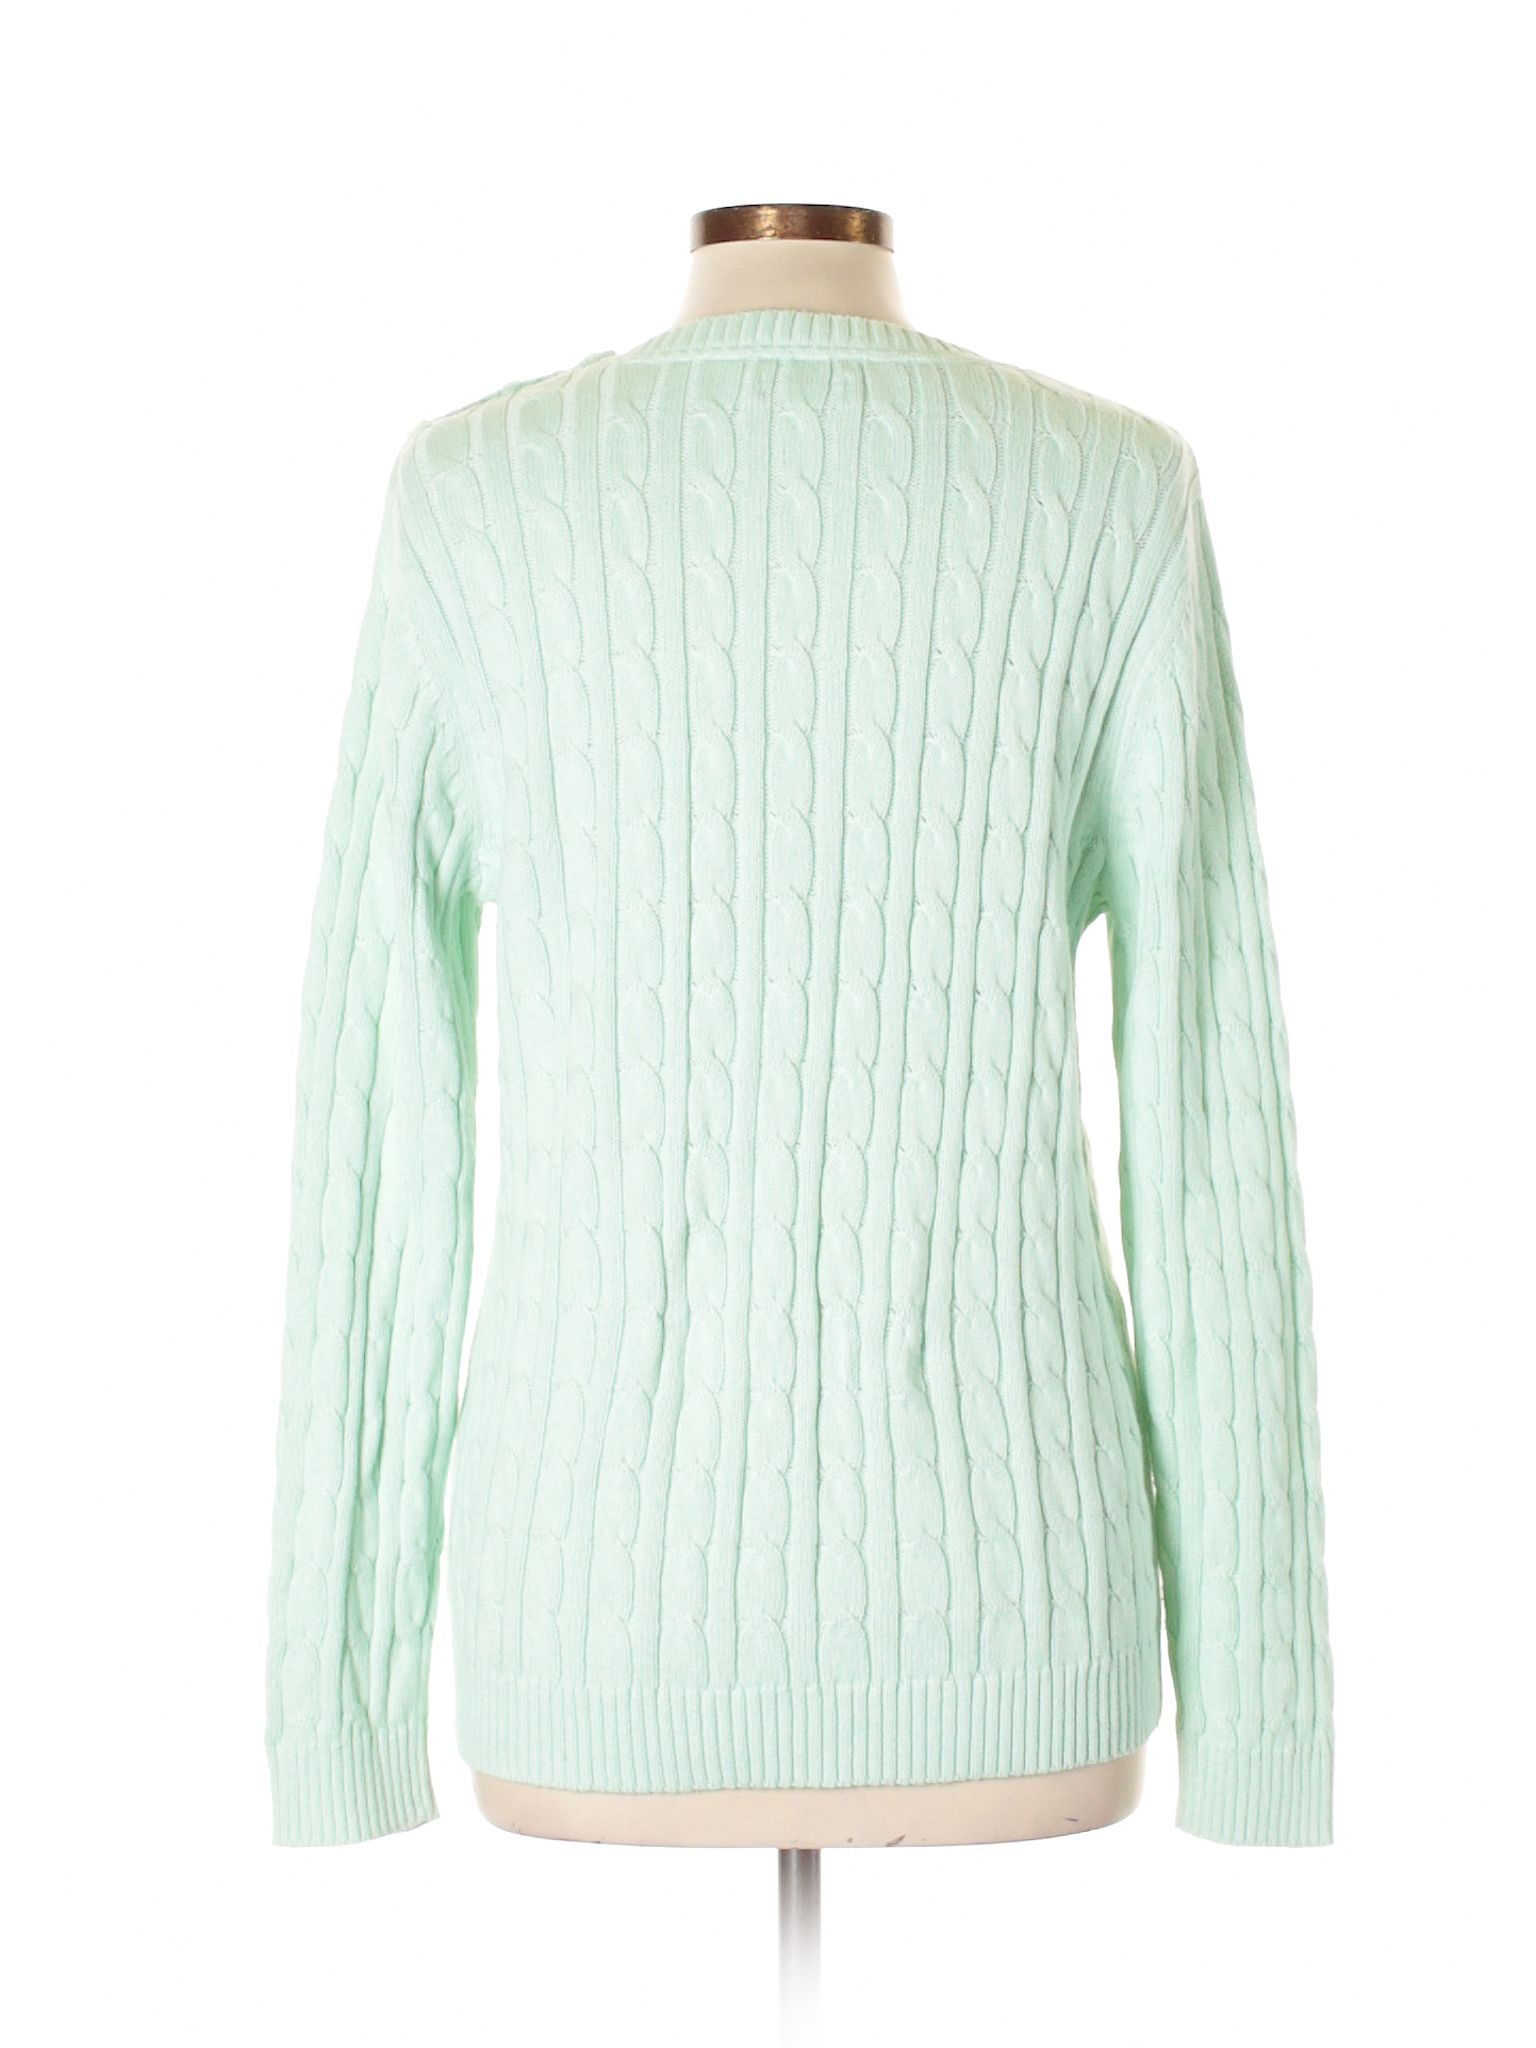 Croft u Barrow Pullover Sweater Light Green Womenus Tops